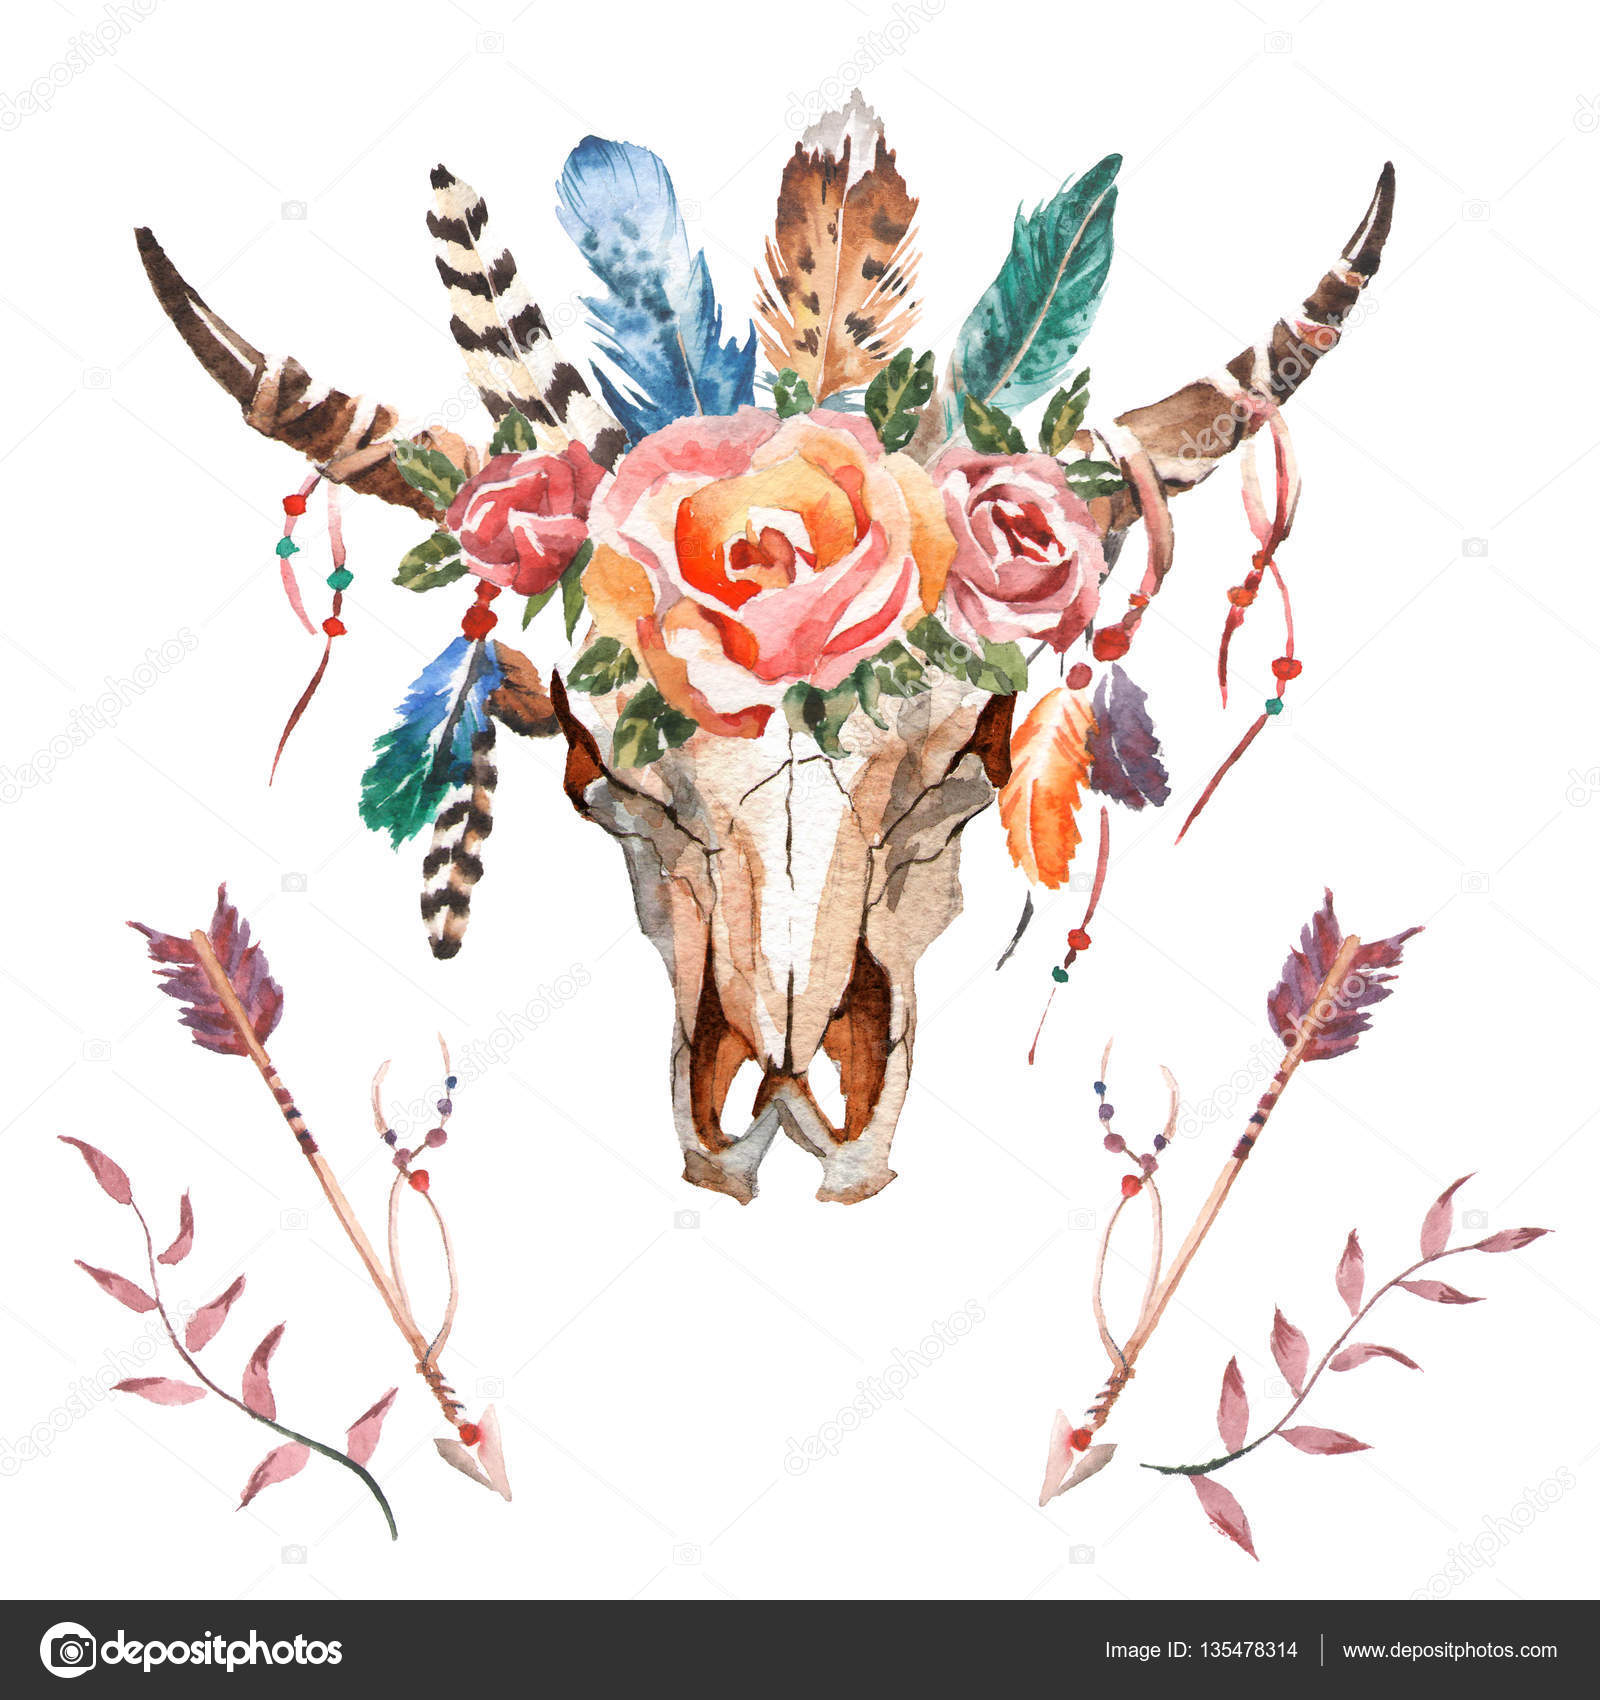 Flores plumas animal elementos de la imagen de acuarela for Imagenes boho chic